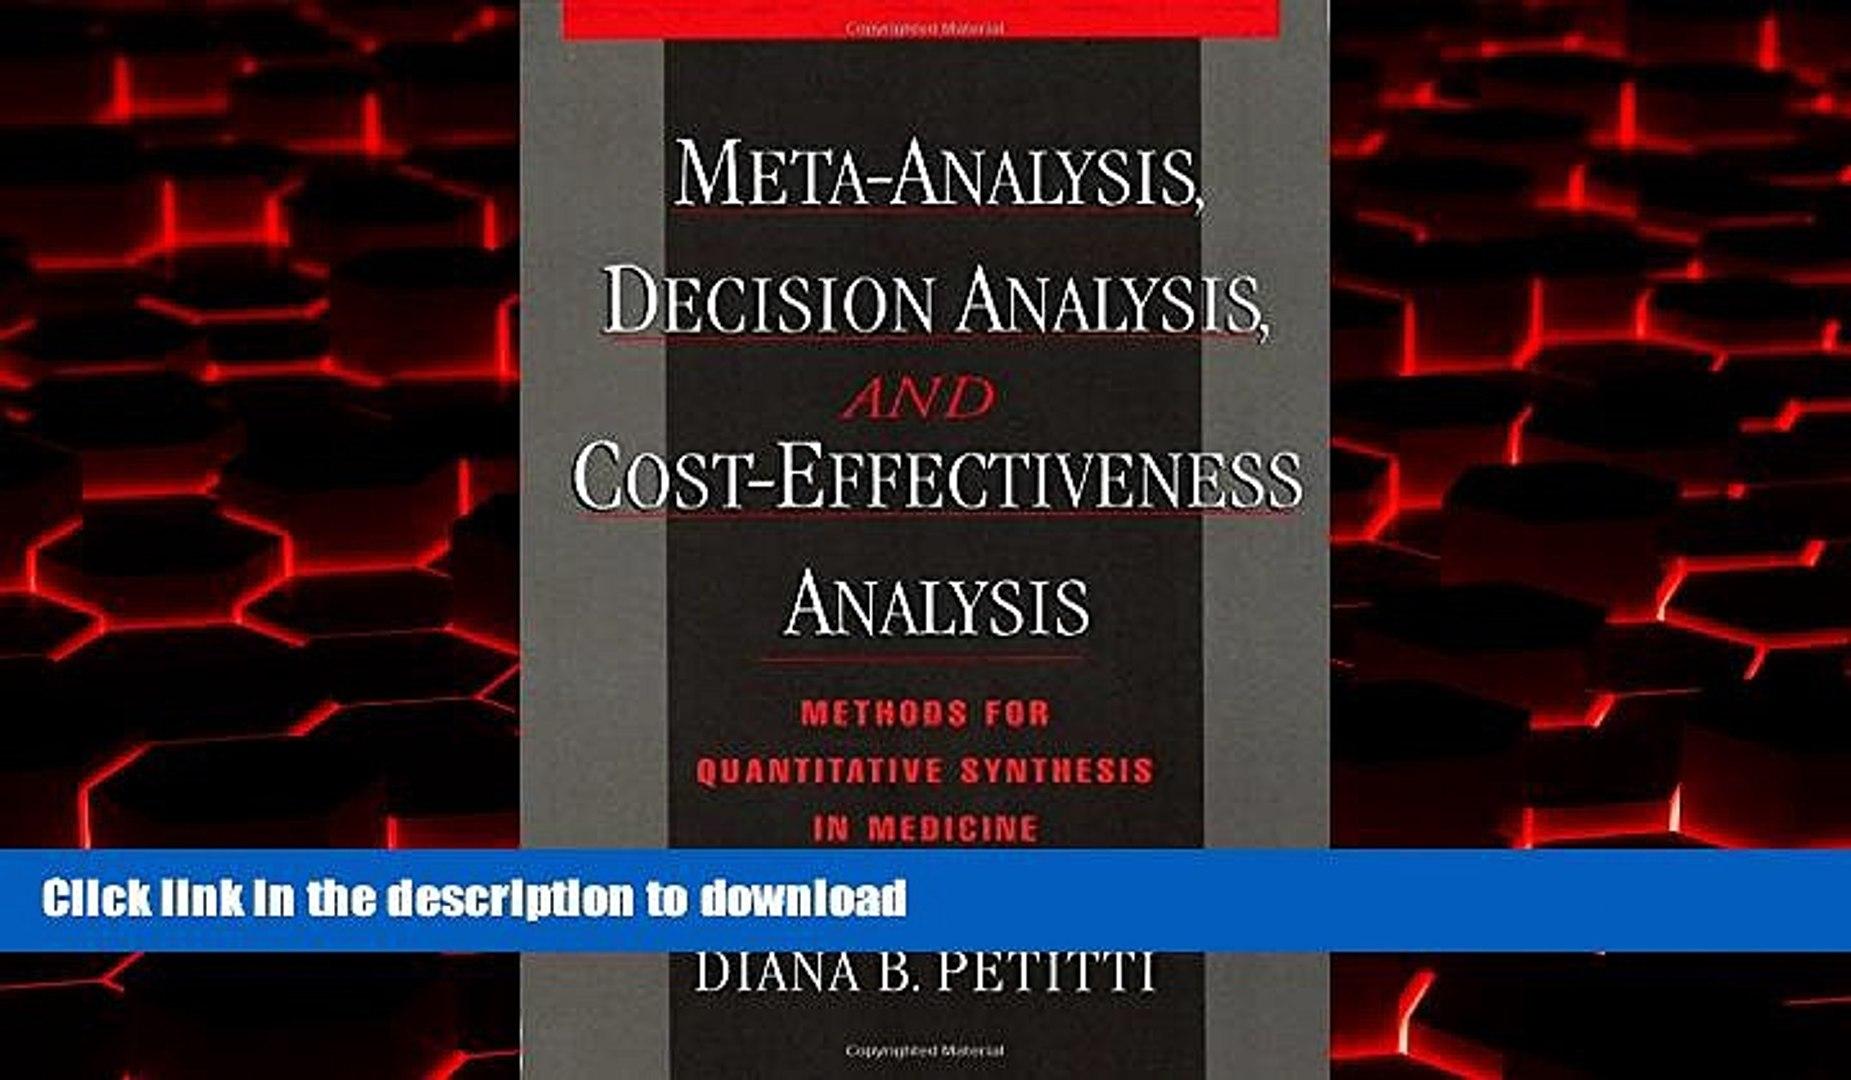 liberty books  Meta-Analysis, Decision Analysis, and Cost-Effectiveness Analysis: Methods for